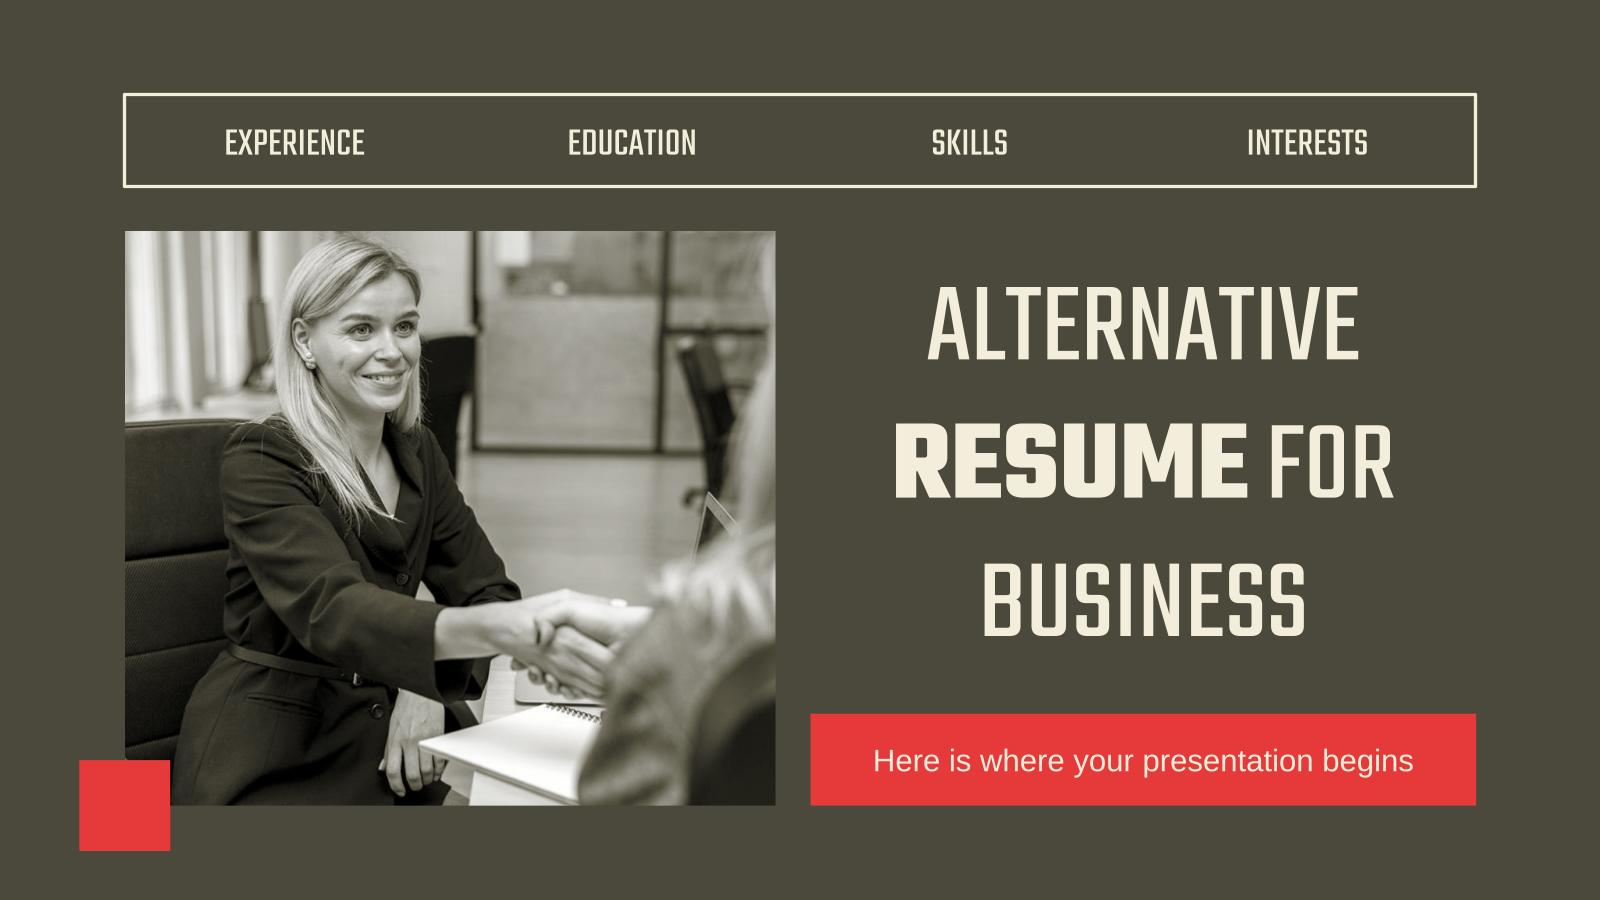 Plantilla de presentación CV alternativo para negocios